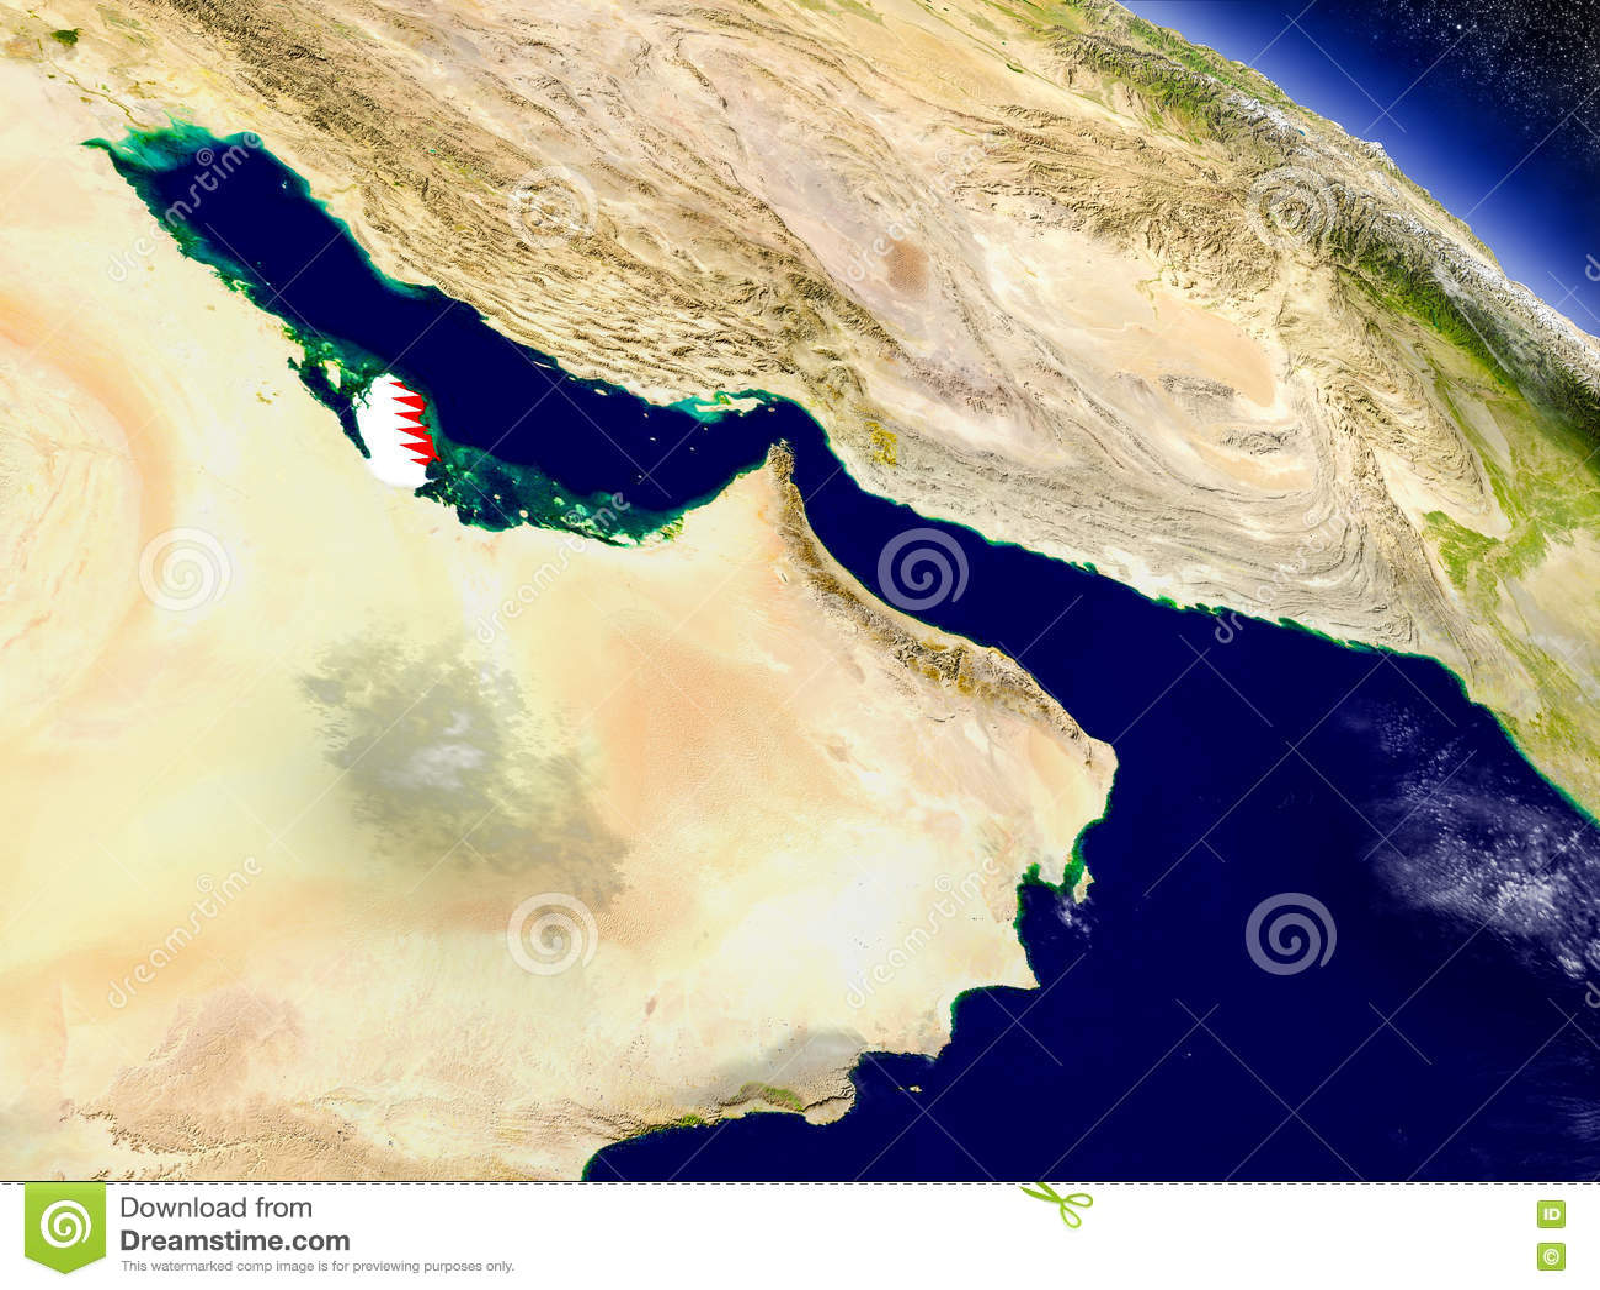 Катар с врезанным флагом на земле